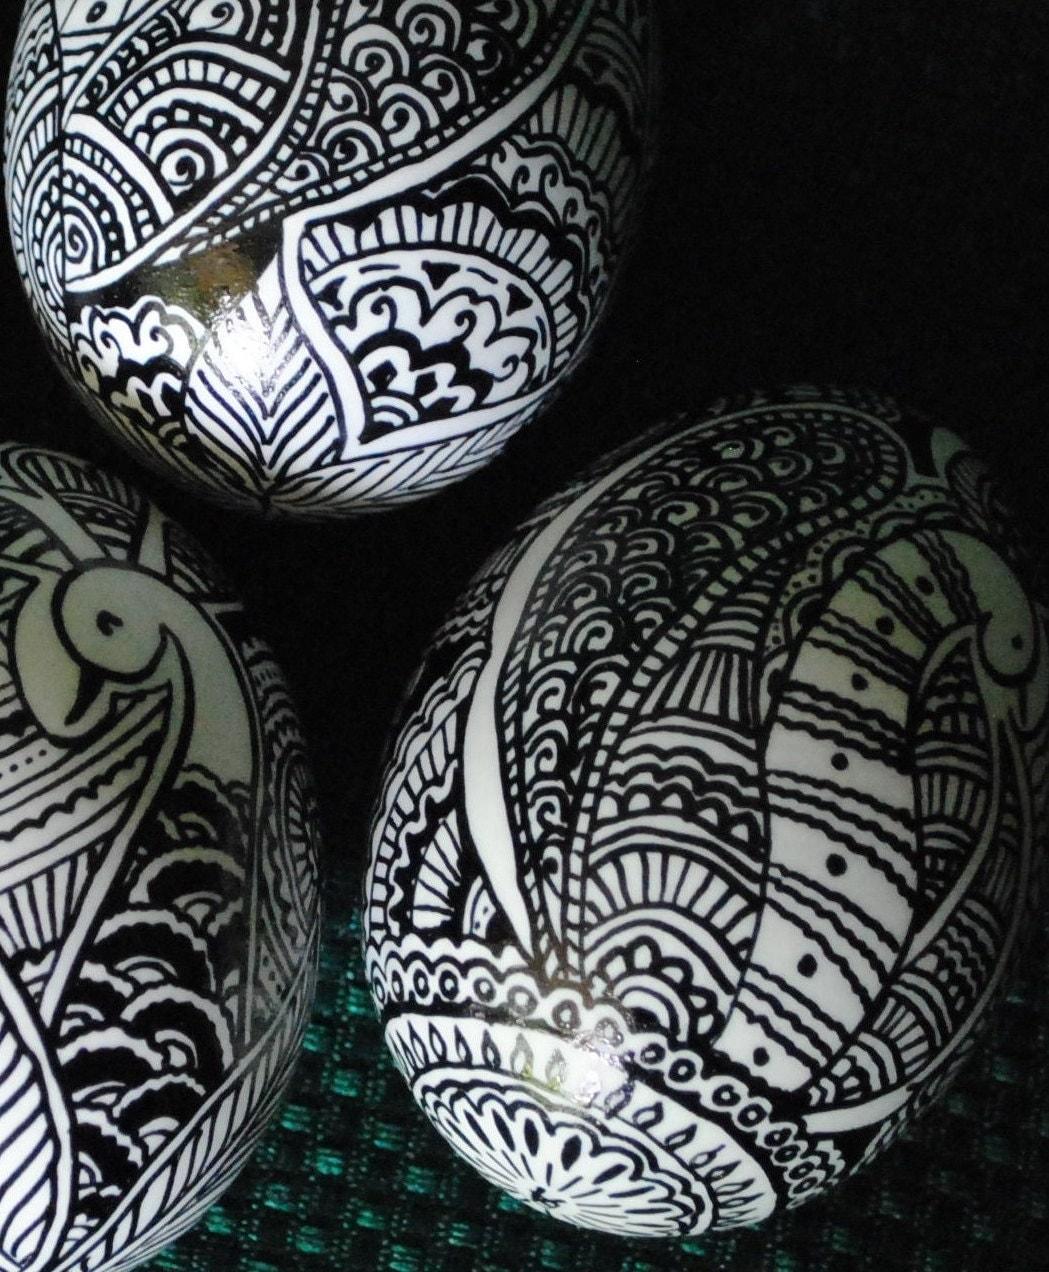 ukrainian decorated eggspysankyvintage by theeggnpagan